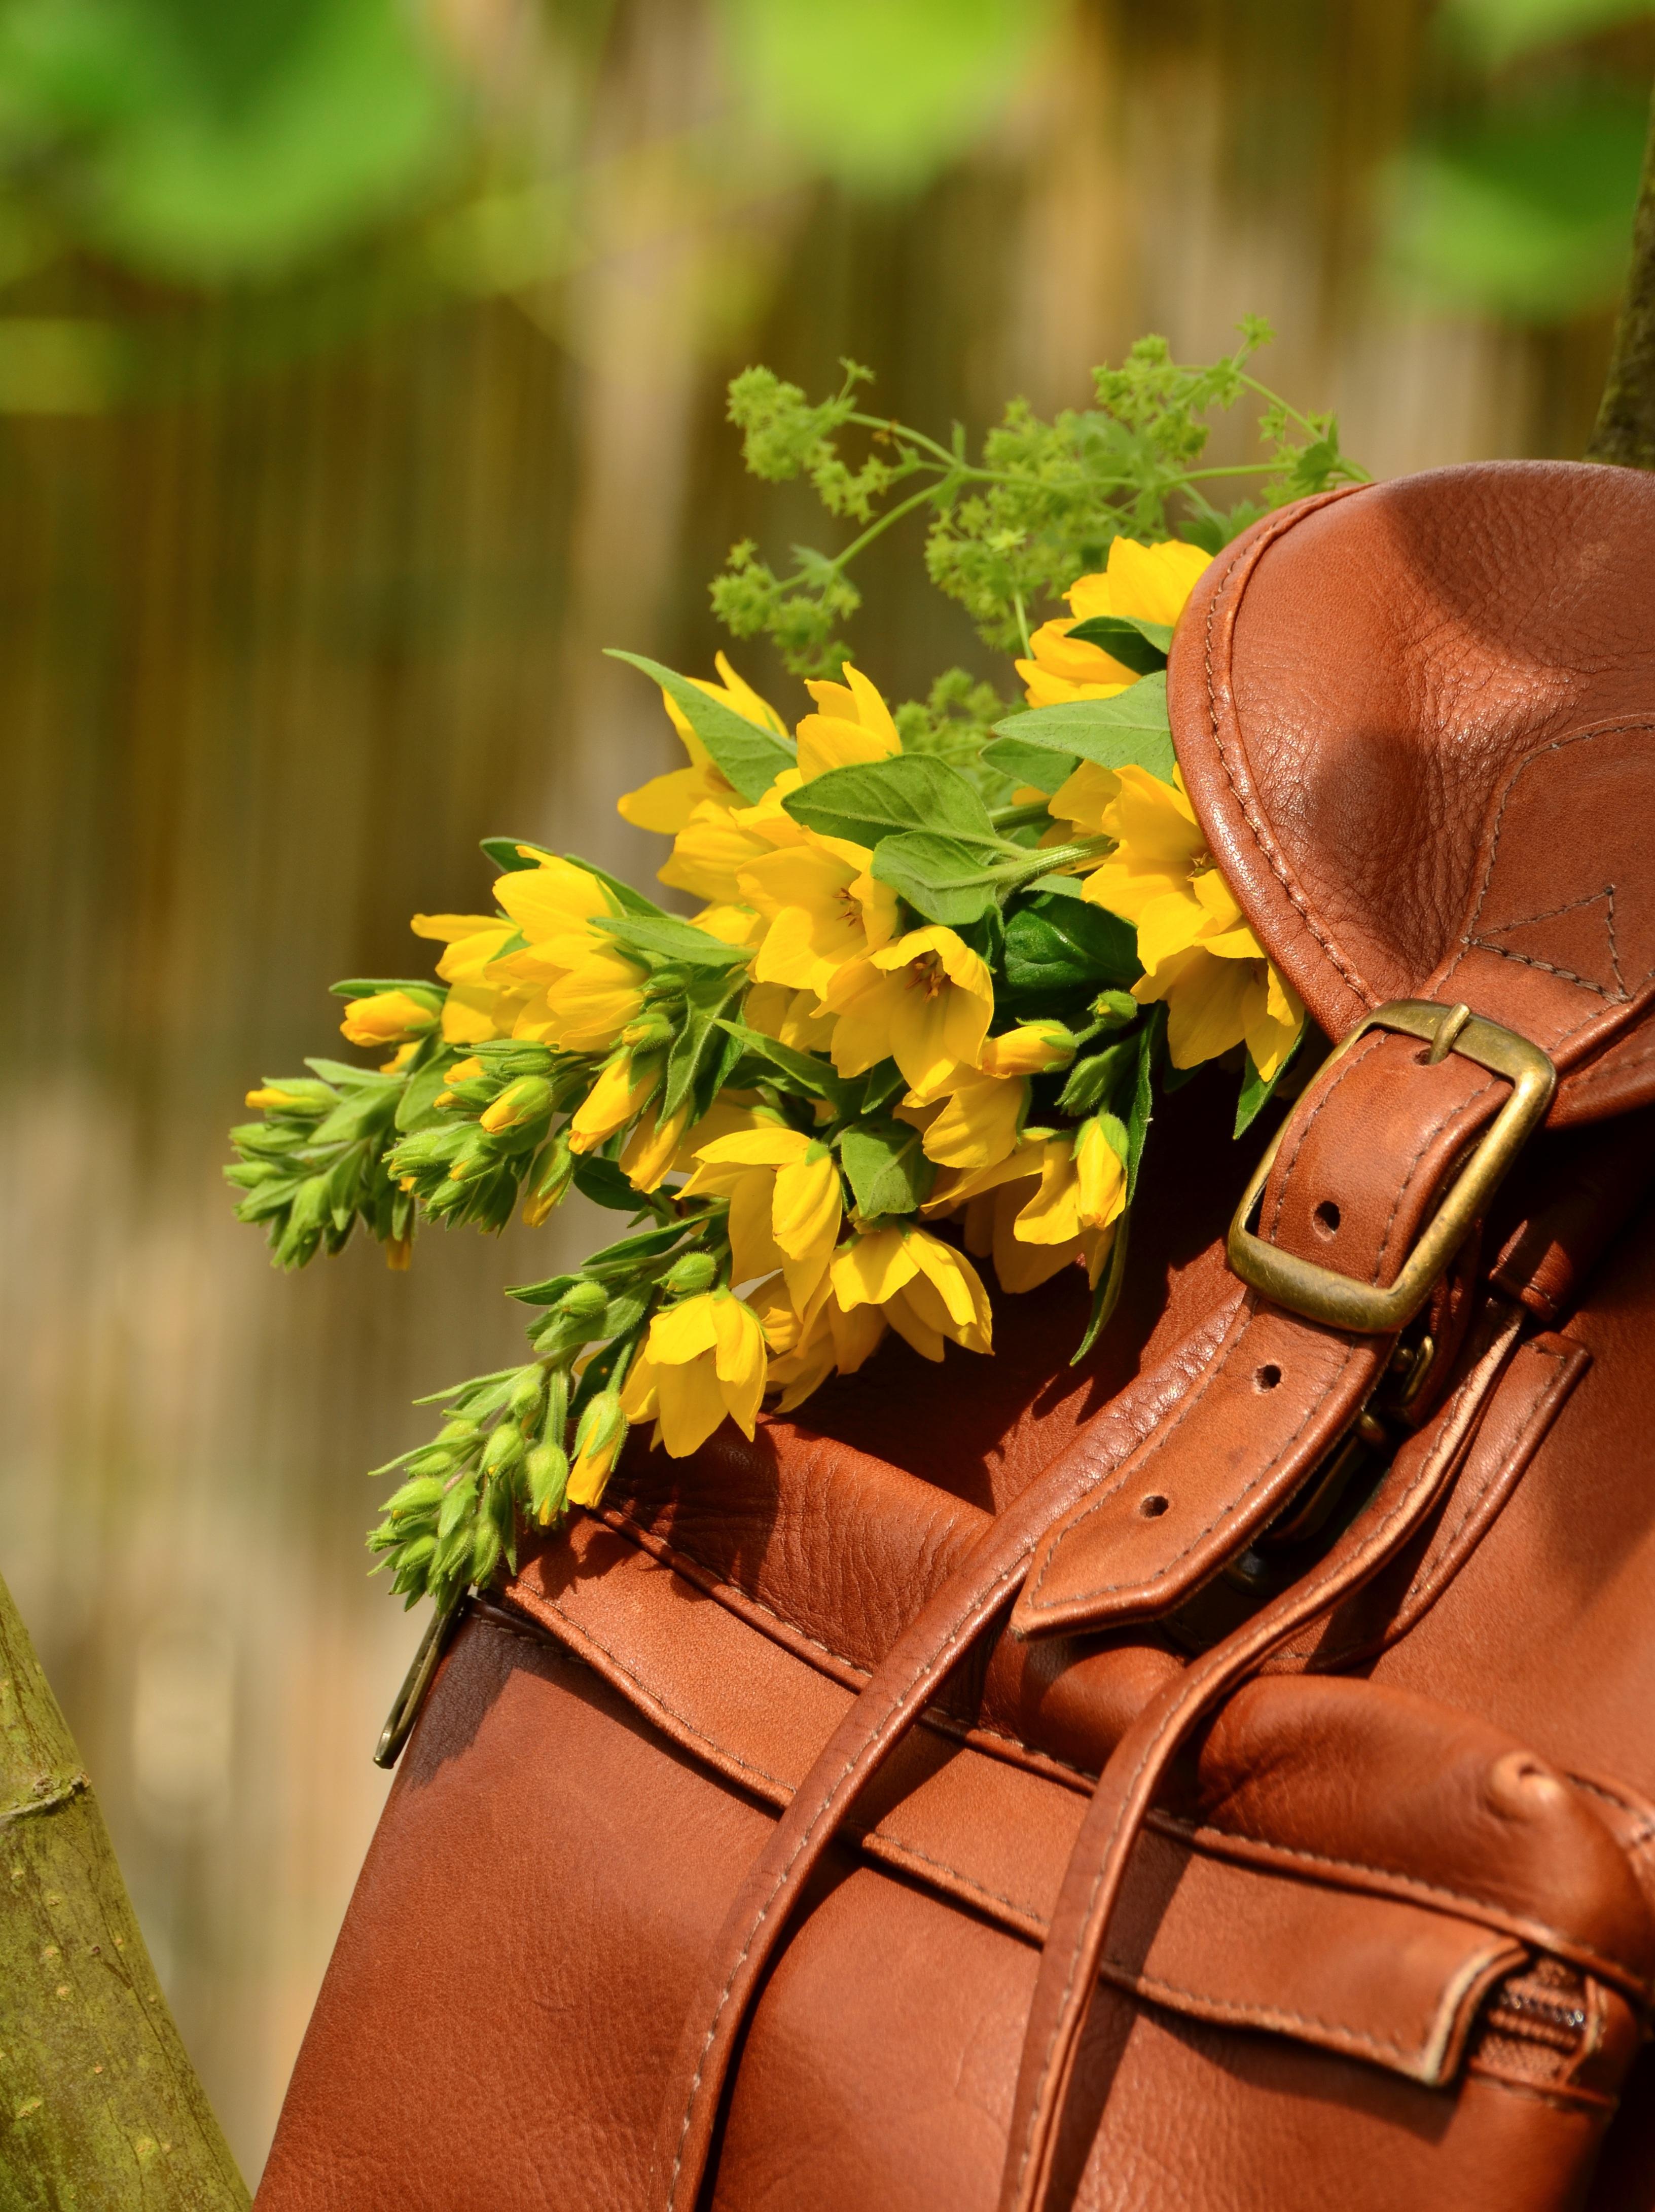 Free Images Plant Leaf Bloom Backpack Rustic Spring Green